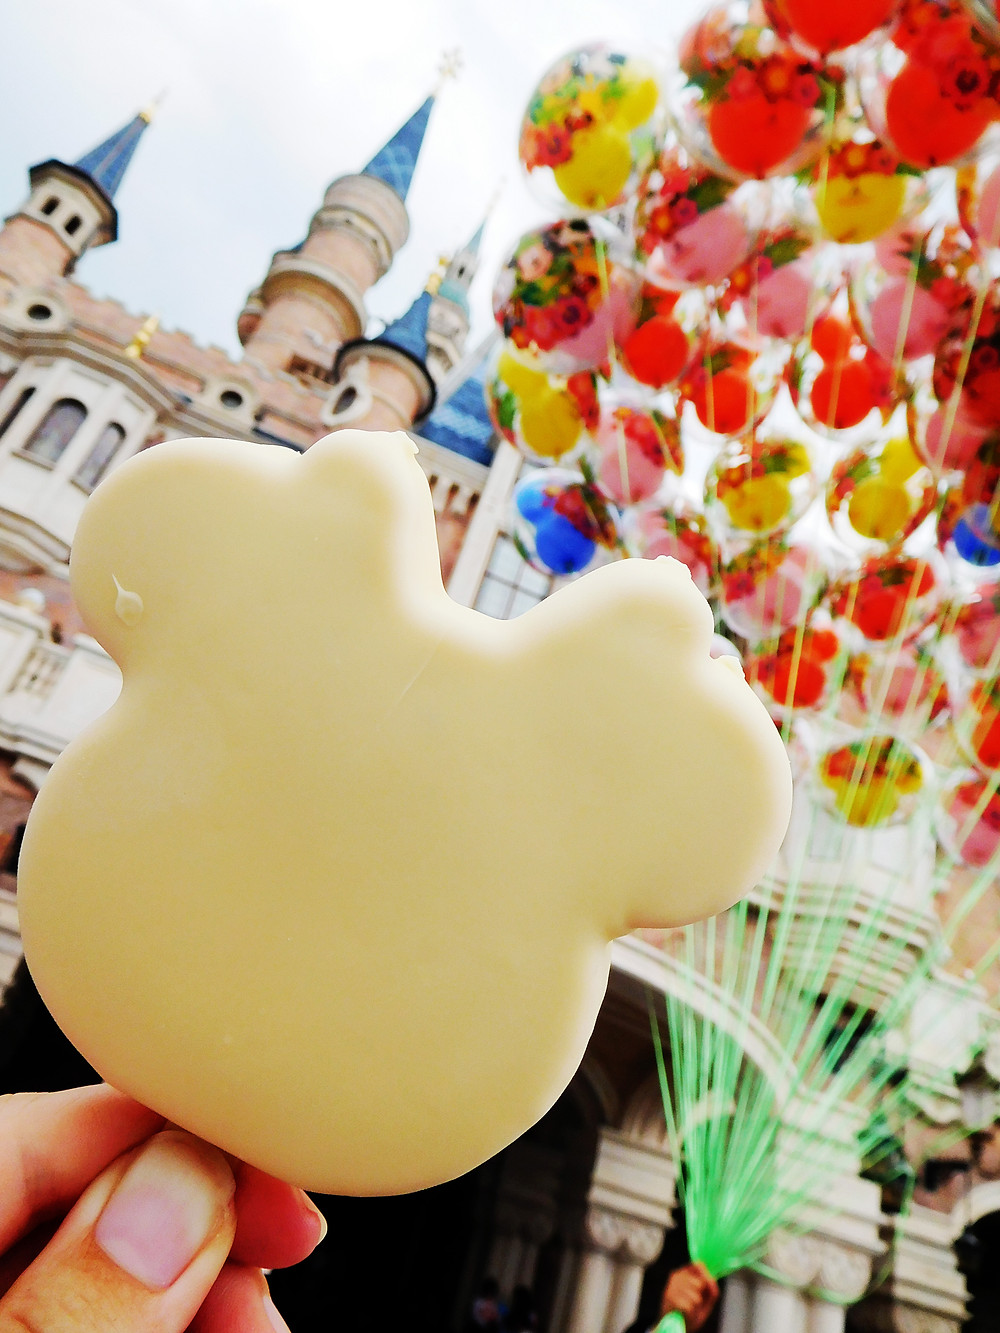 Minnie Mouse ice cream bar at Shanghai Disney Resort